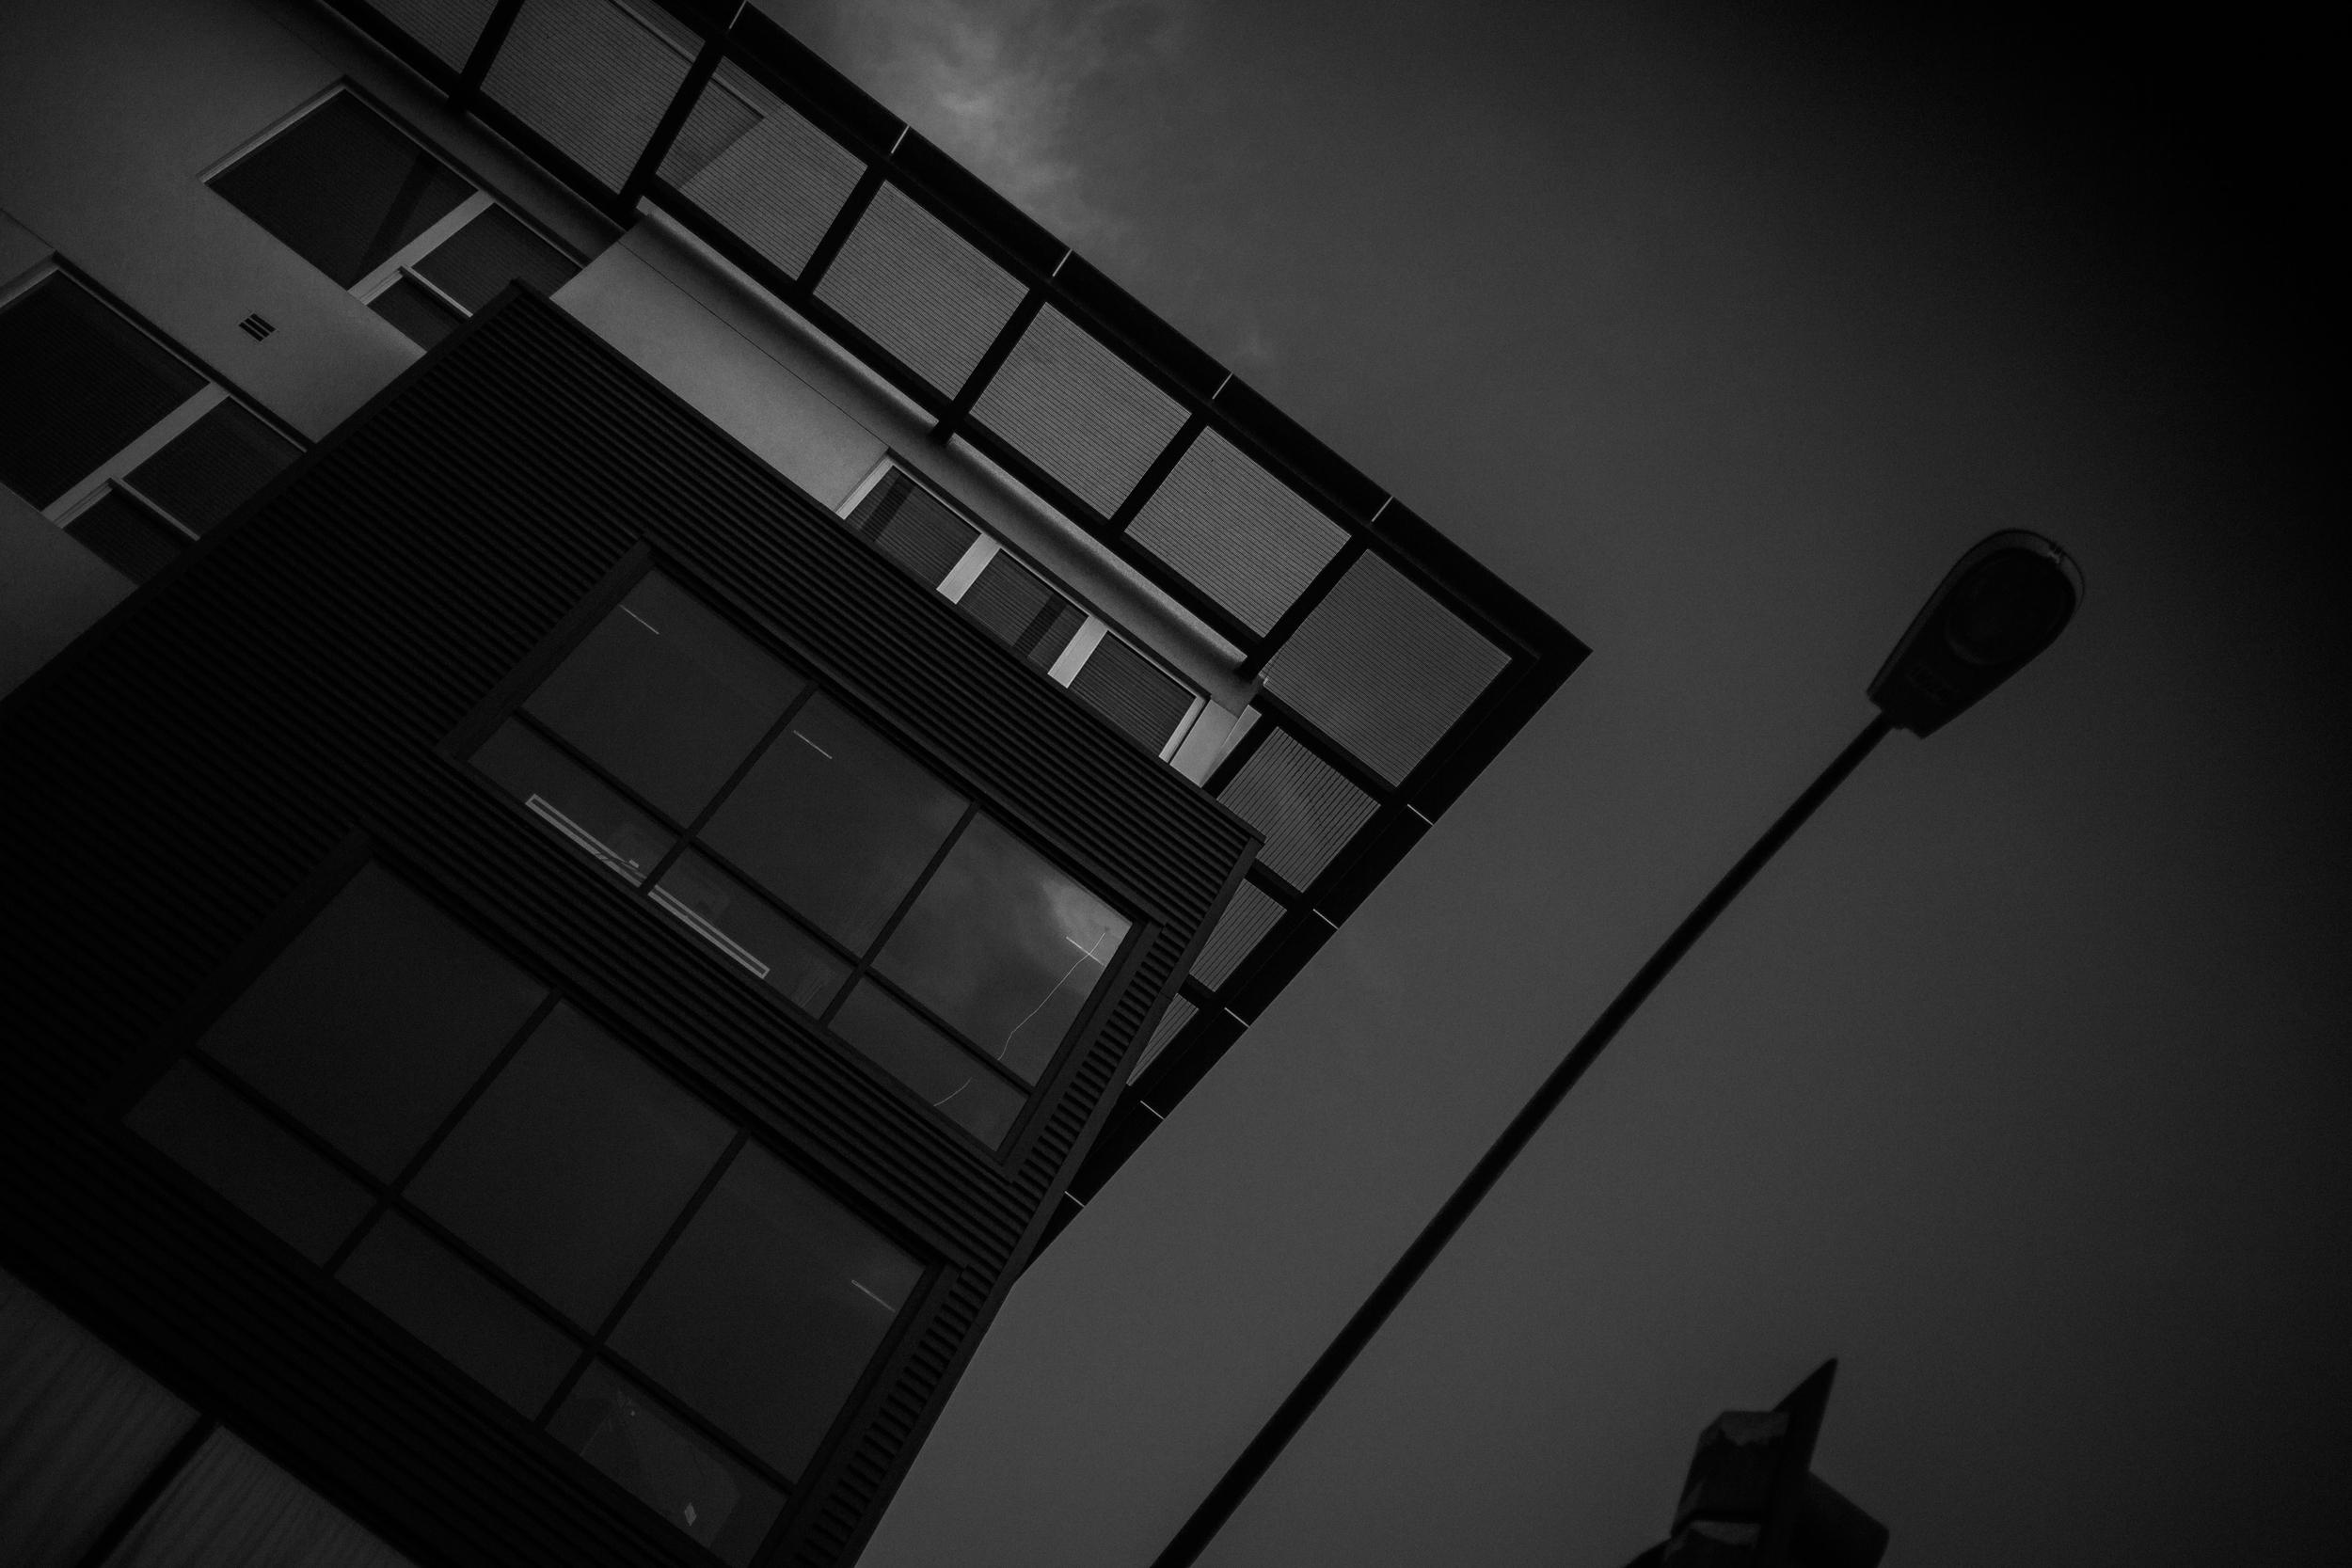 san diego wedding   photographer | monotone diamond shot of skyrise building with street light in   view